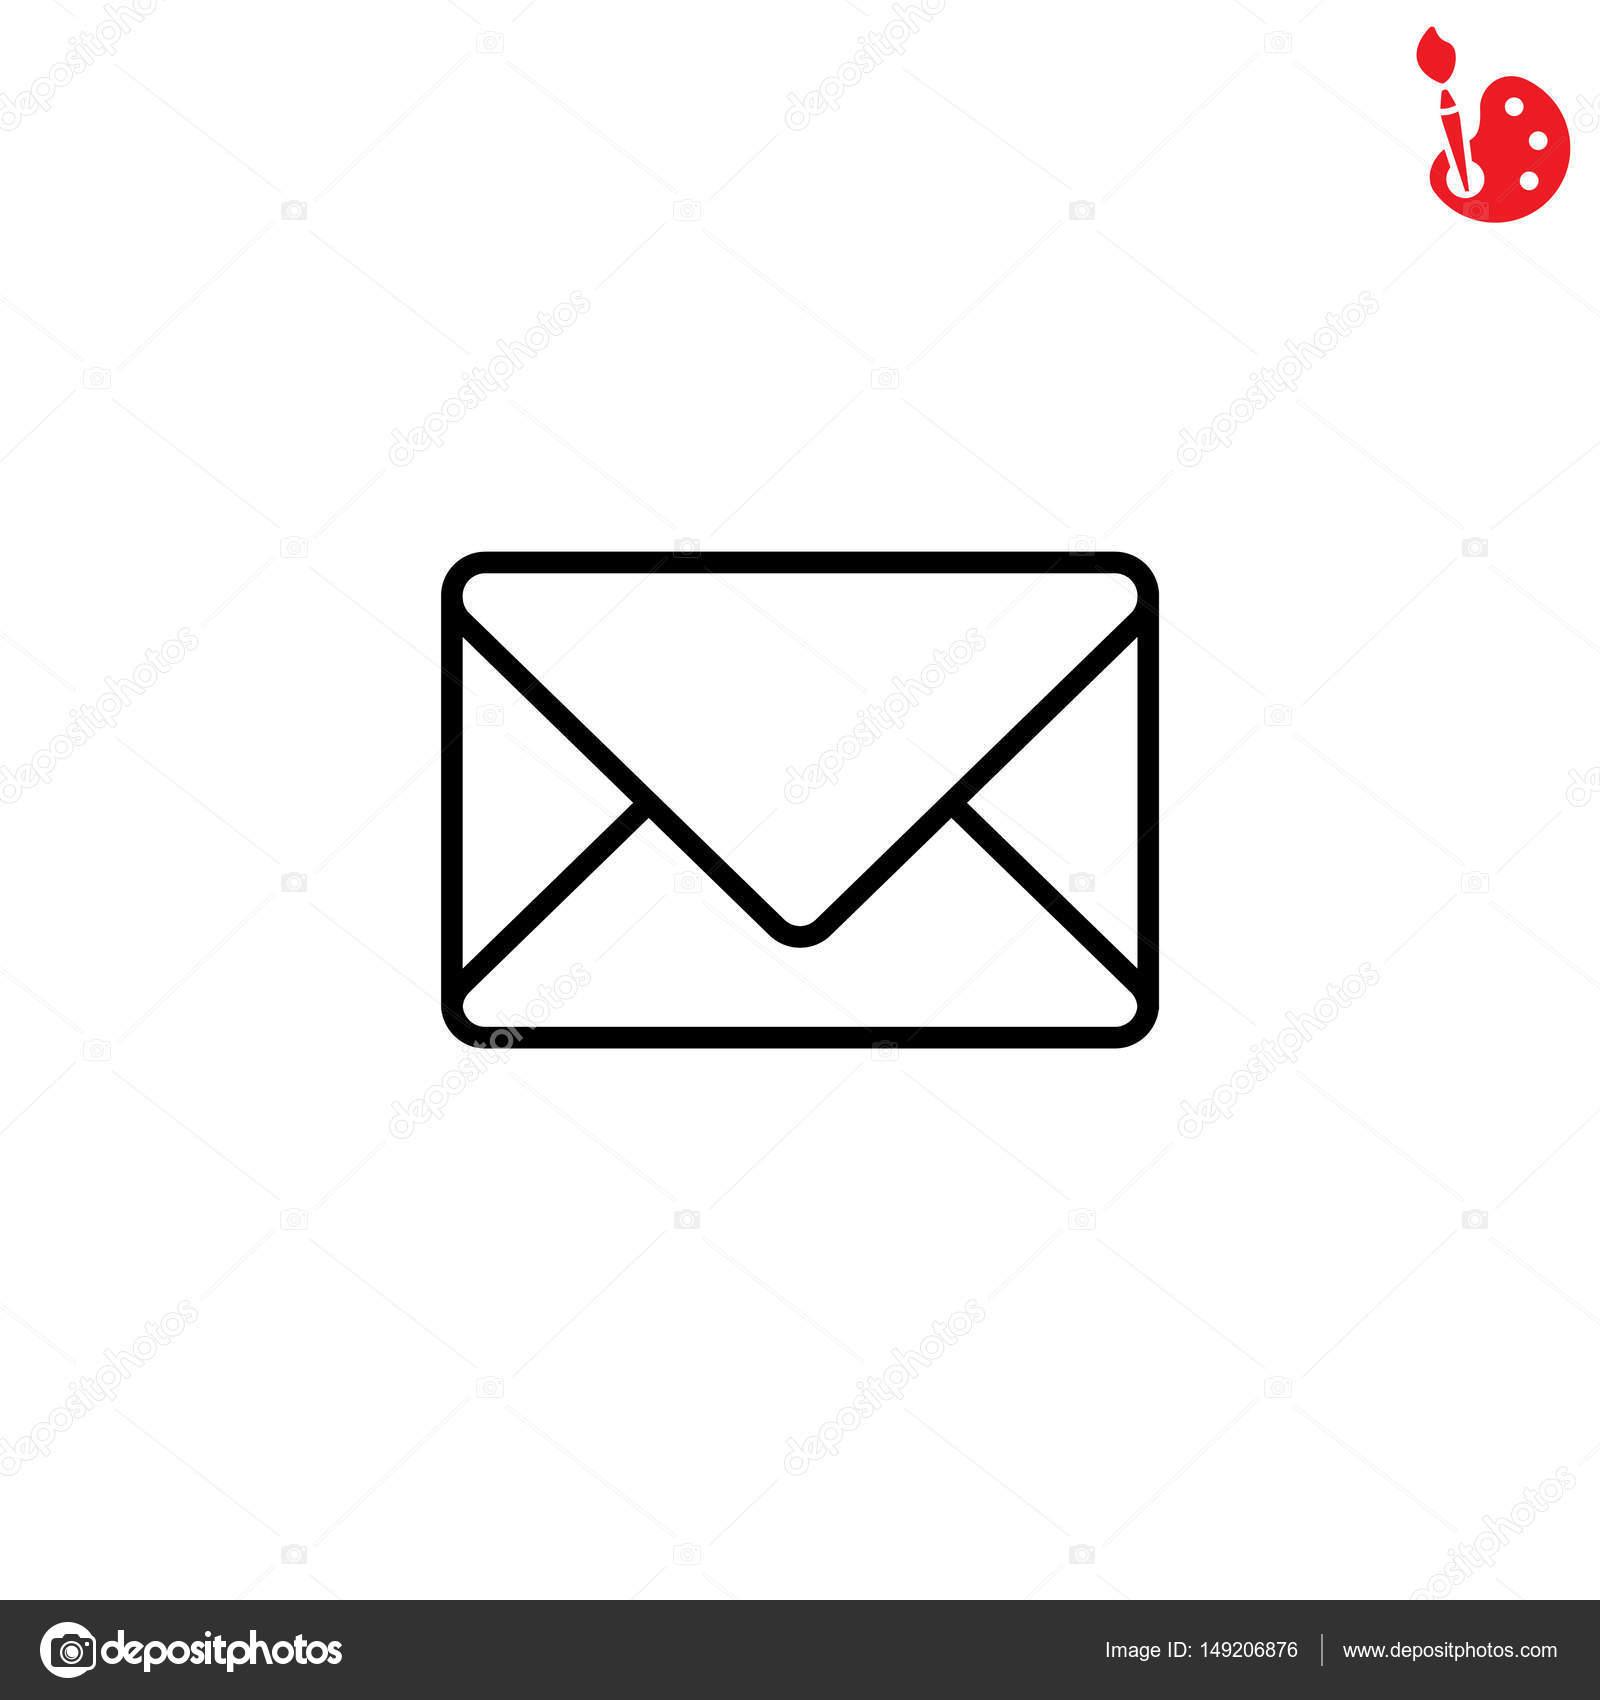 Briefumschlag-Symbol — Stockvektor © PPVector #149206876